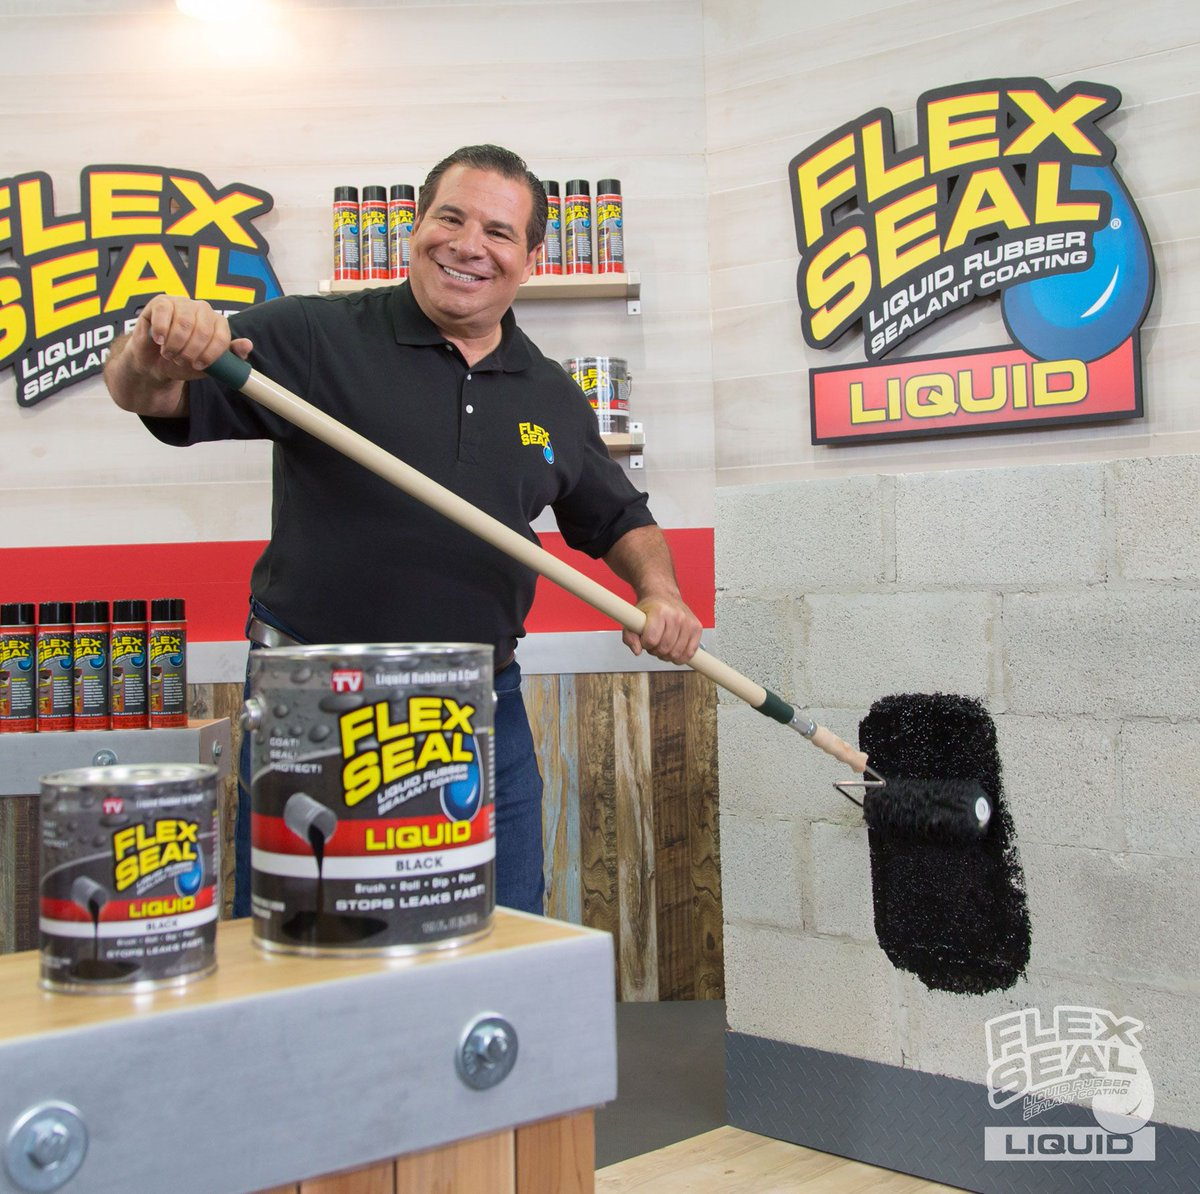 Flex Sealverified Account